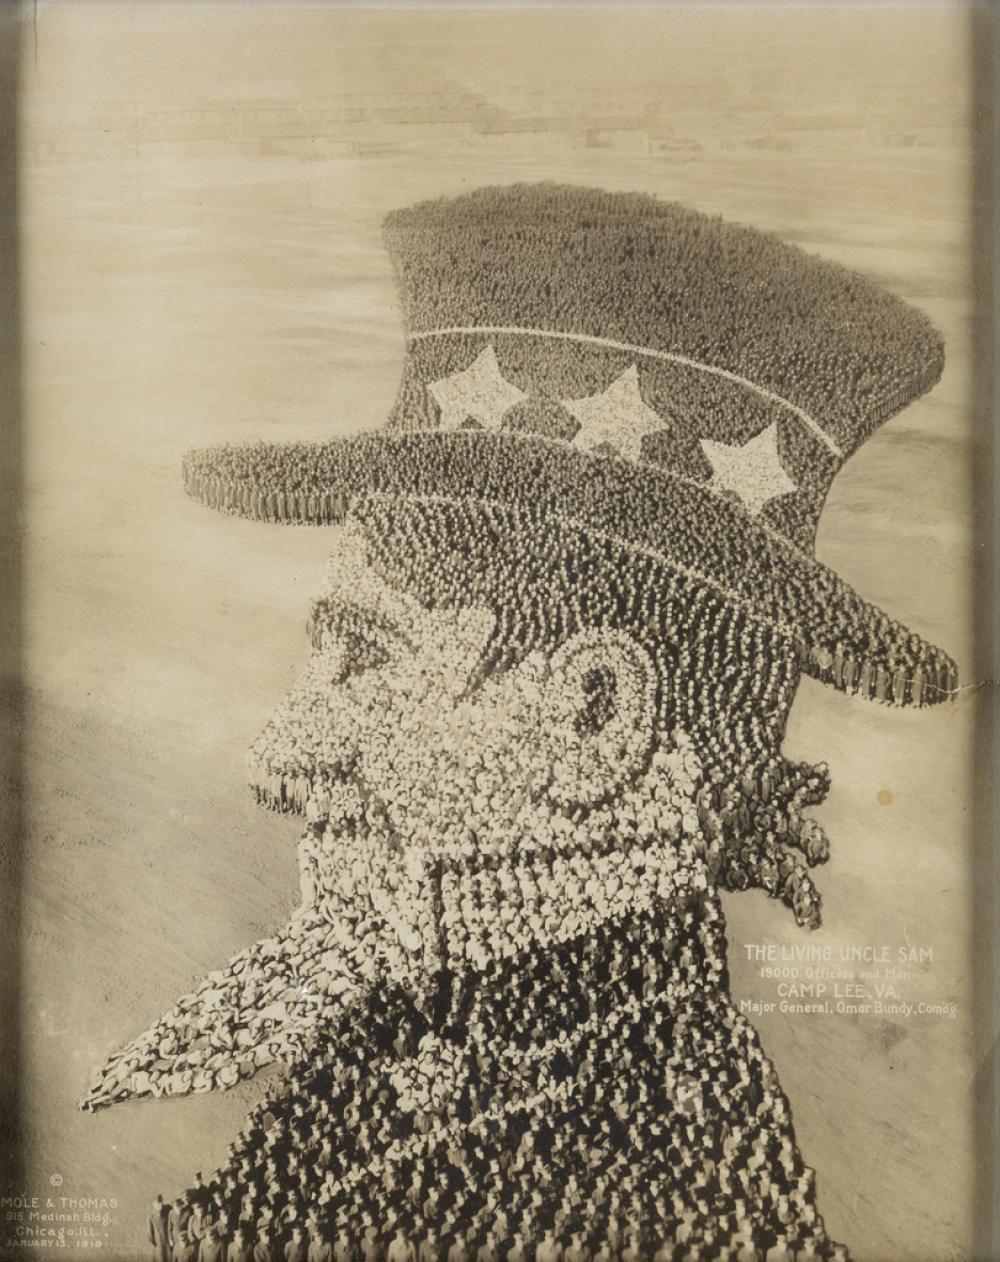 ARTHUR MOLE (1889-1983) & JOHN THOMAS (active 1918-1919) The Living Uncle Sam, 19,000 Officers and Men, Camp Lee, VA, Major General, Om